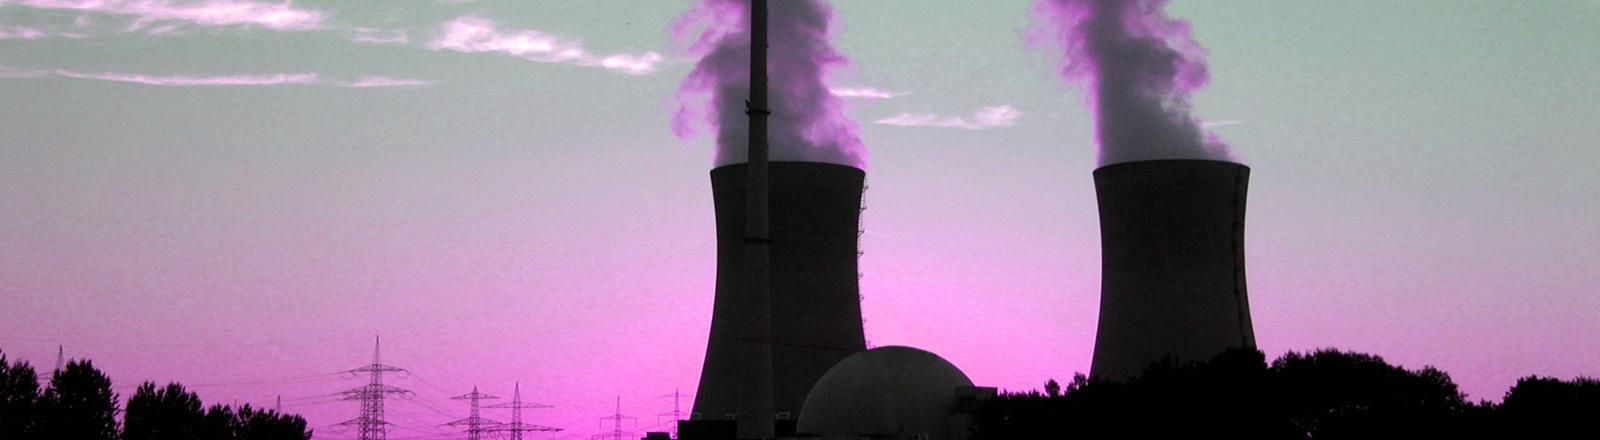 Atomkraftwerk.